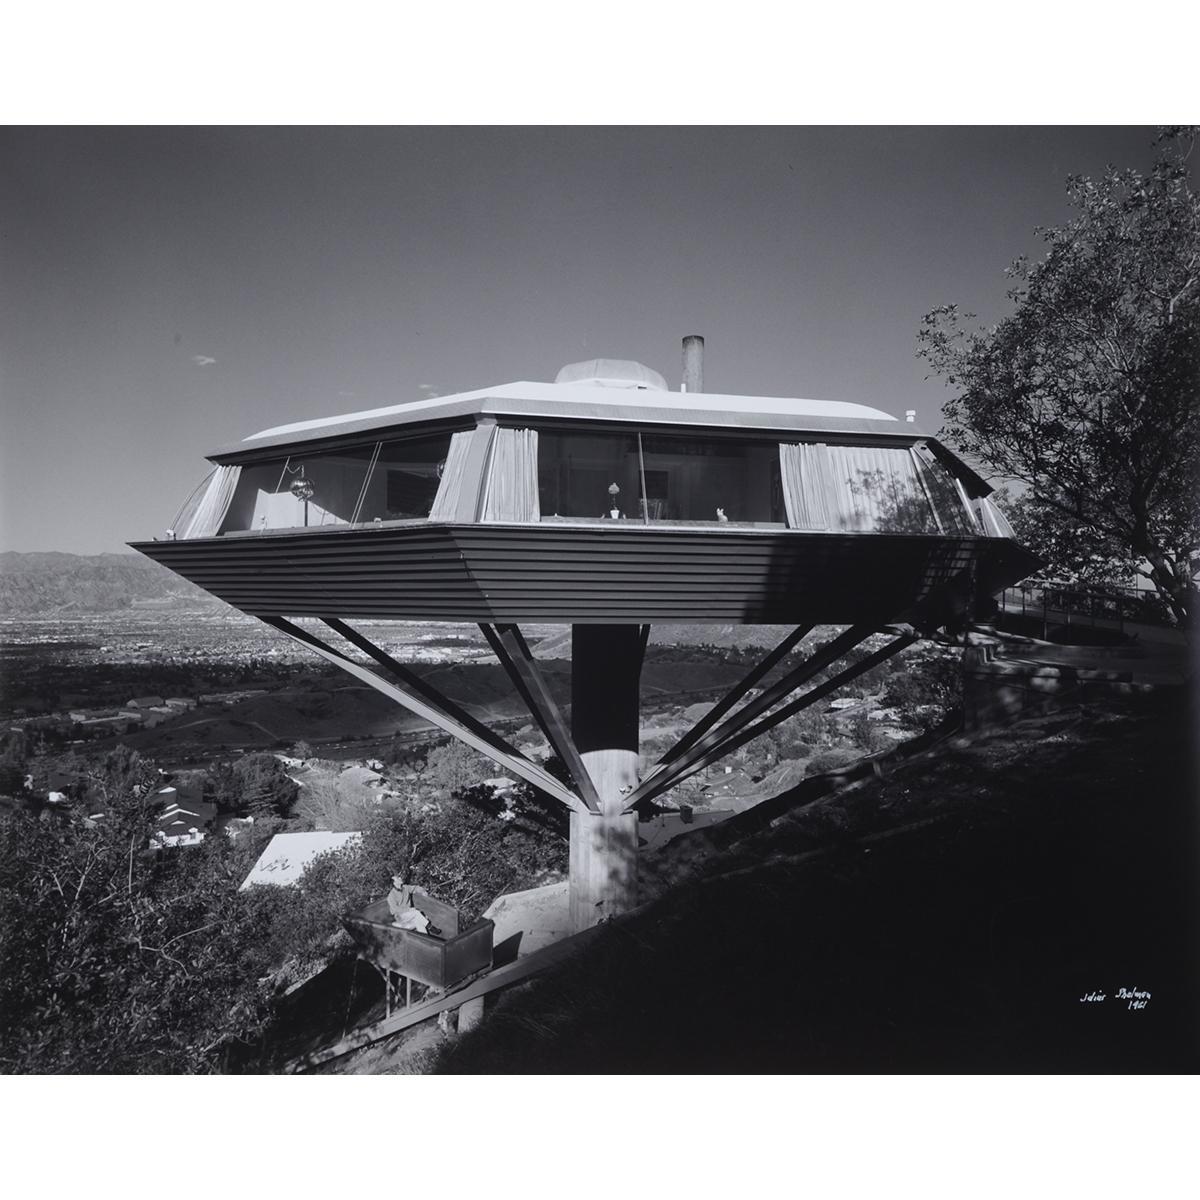 Lot 31 - Julius Schulman (1910-2009), American MALIN ('CHEMOSPHERE' HOUSE) RESIDENCE, DESIGNED BY JOHN